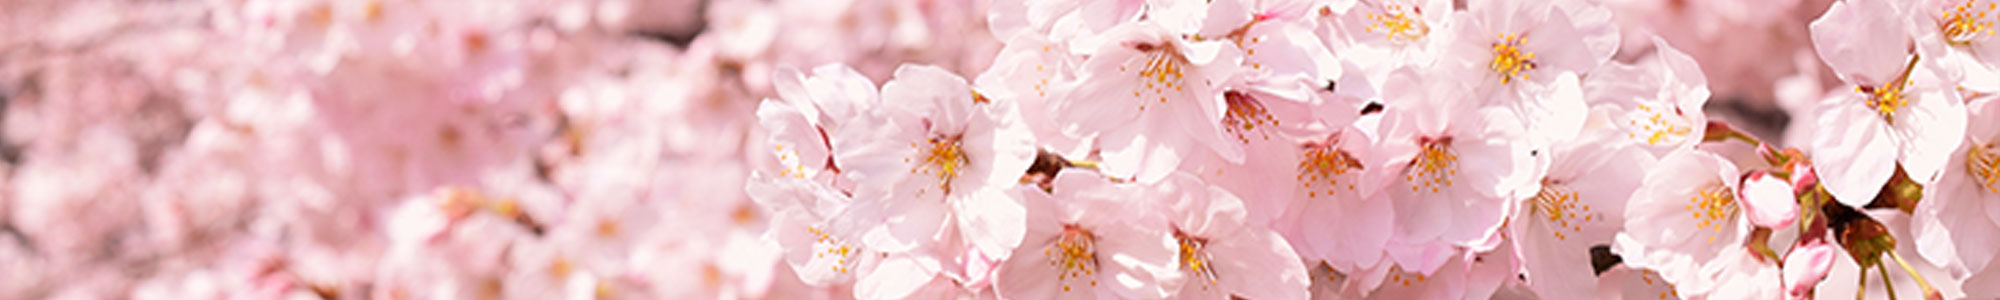 茨城県境町の桜